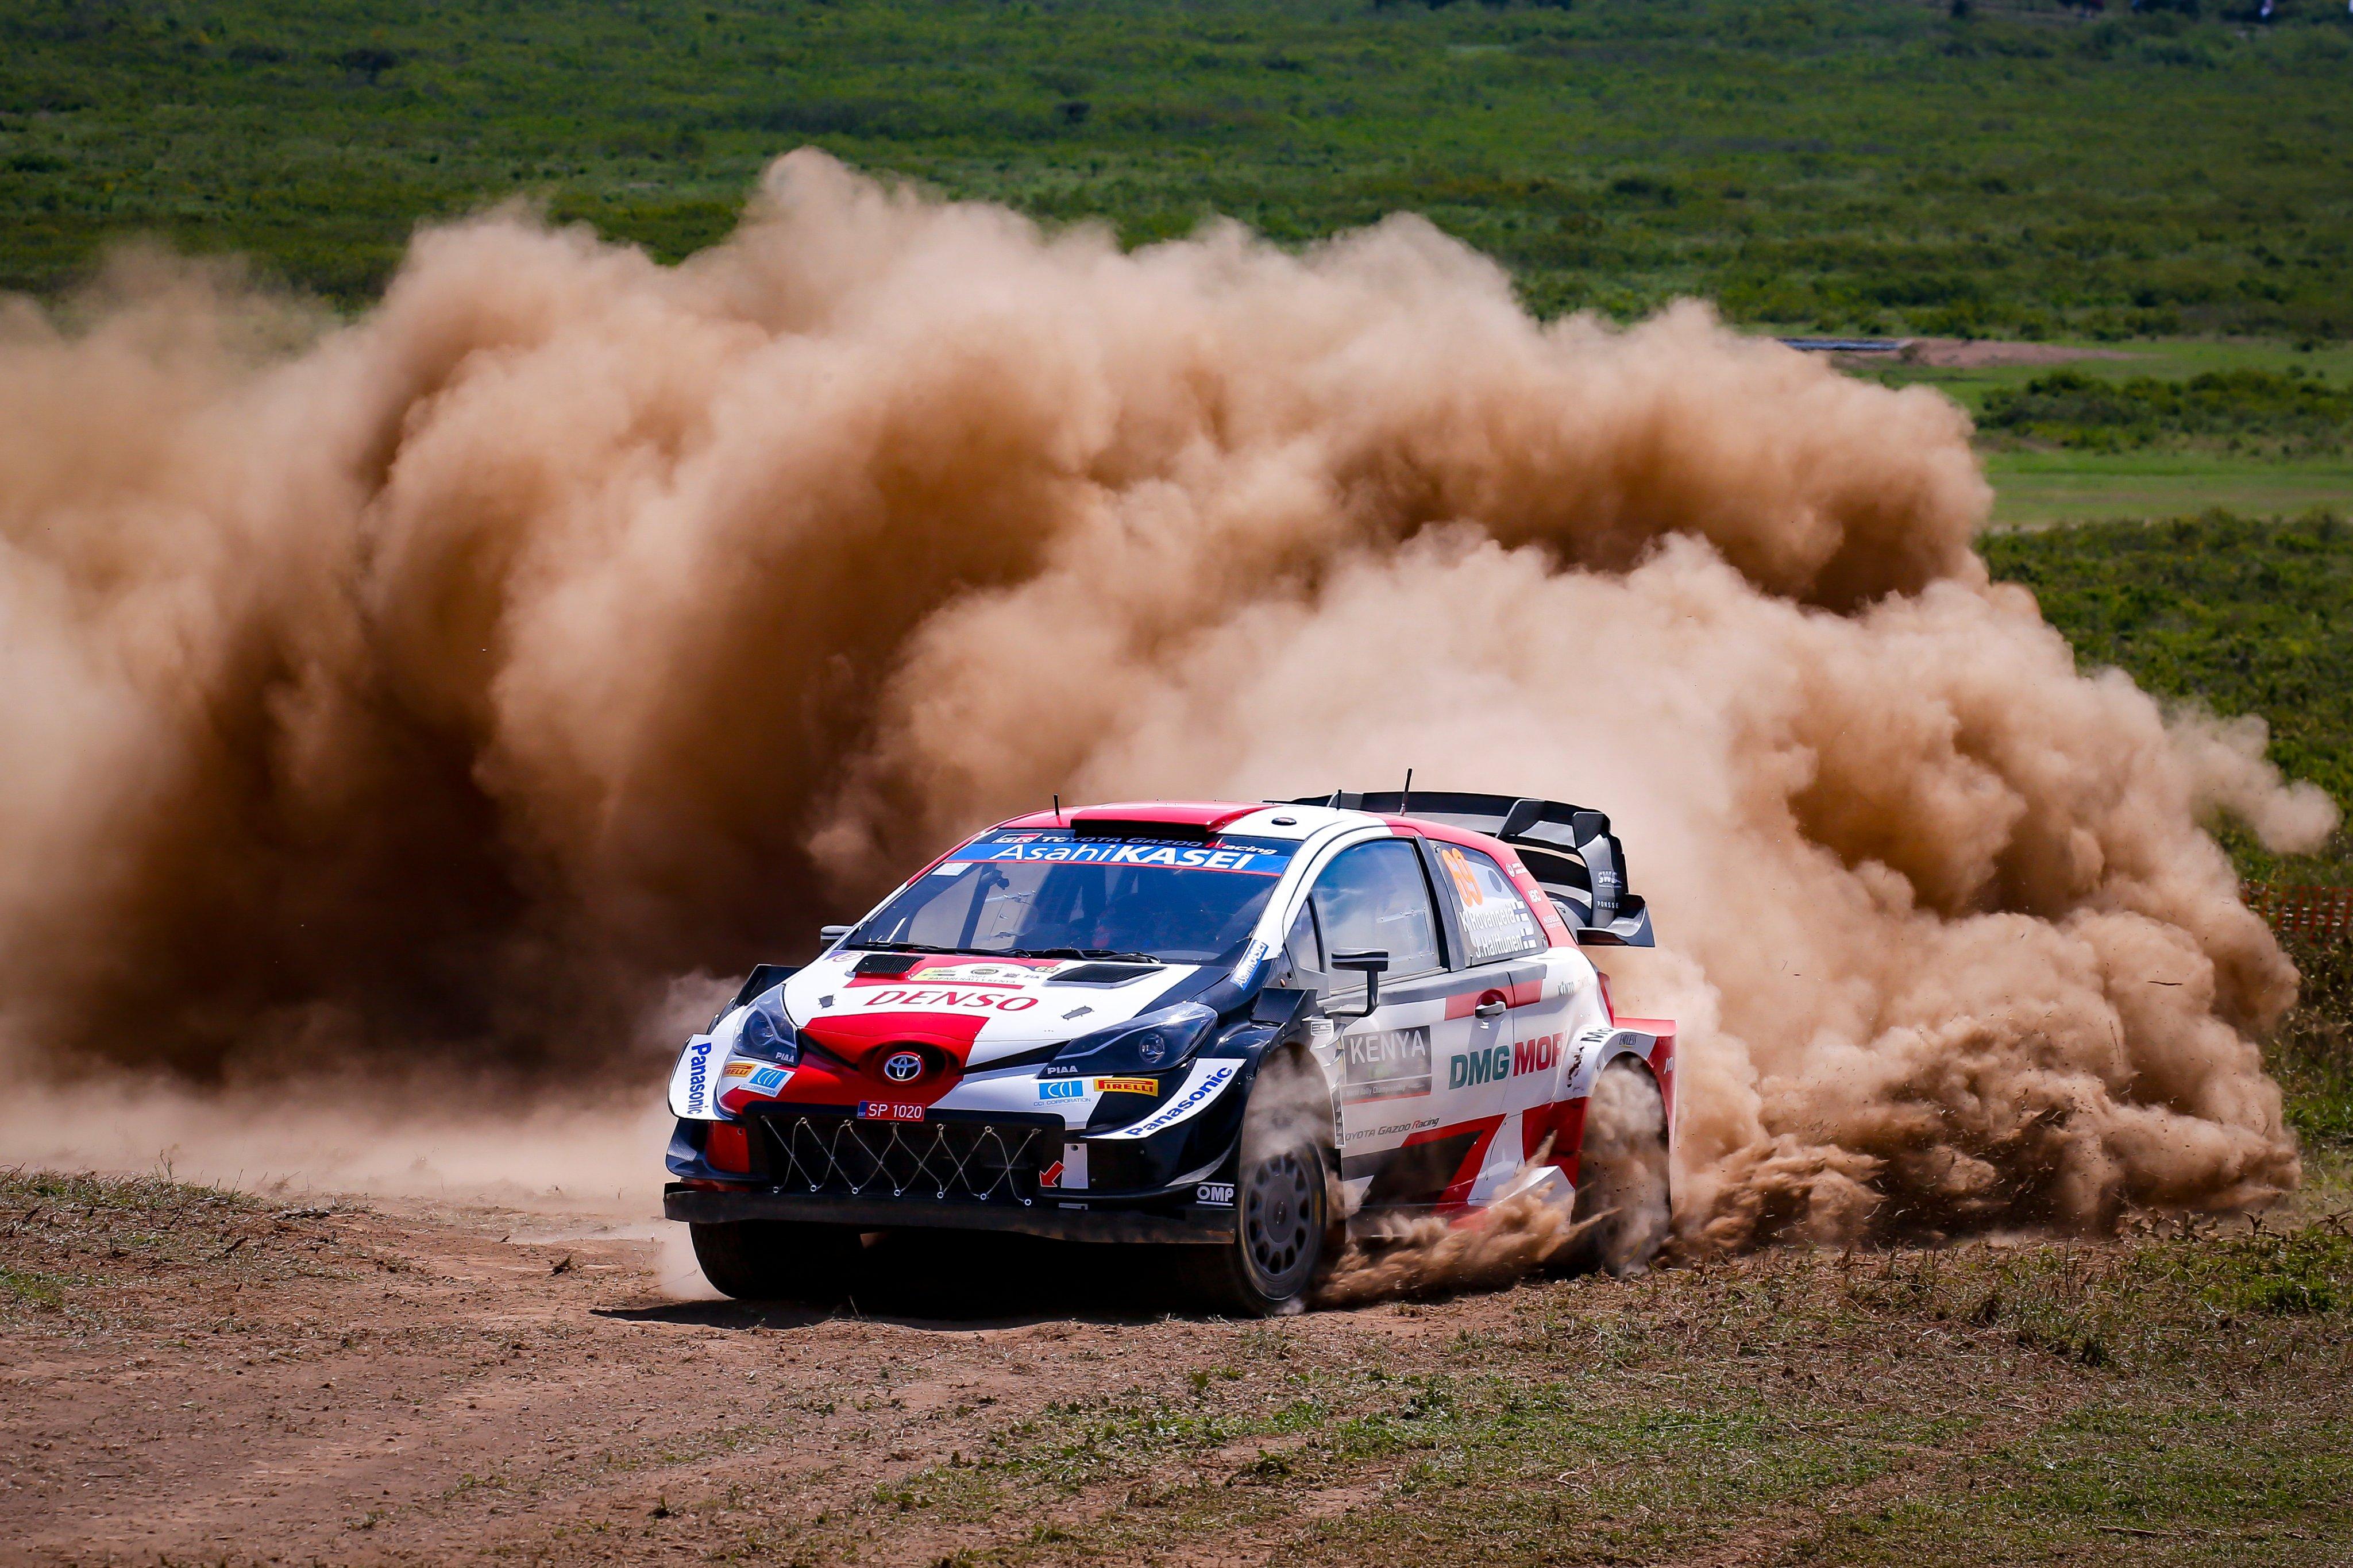 WRC: Safari Rally Kenya [23-27 Junio] - Página 4 E4tZQFoWUAQcoZ4?format=jpg&name=4096x4096